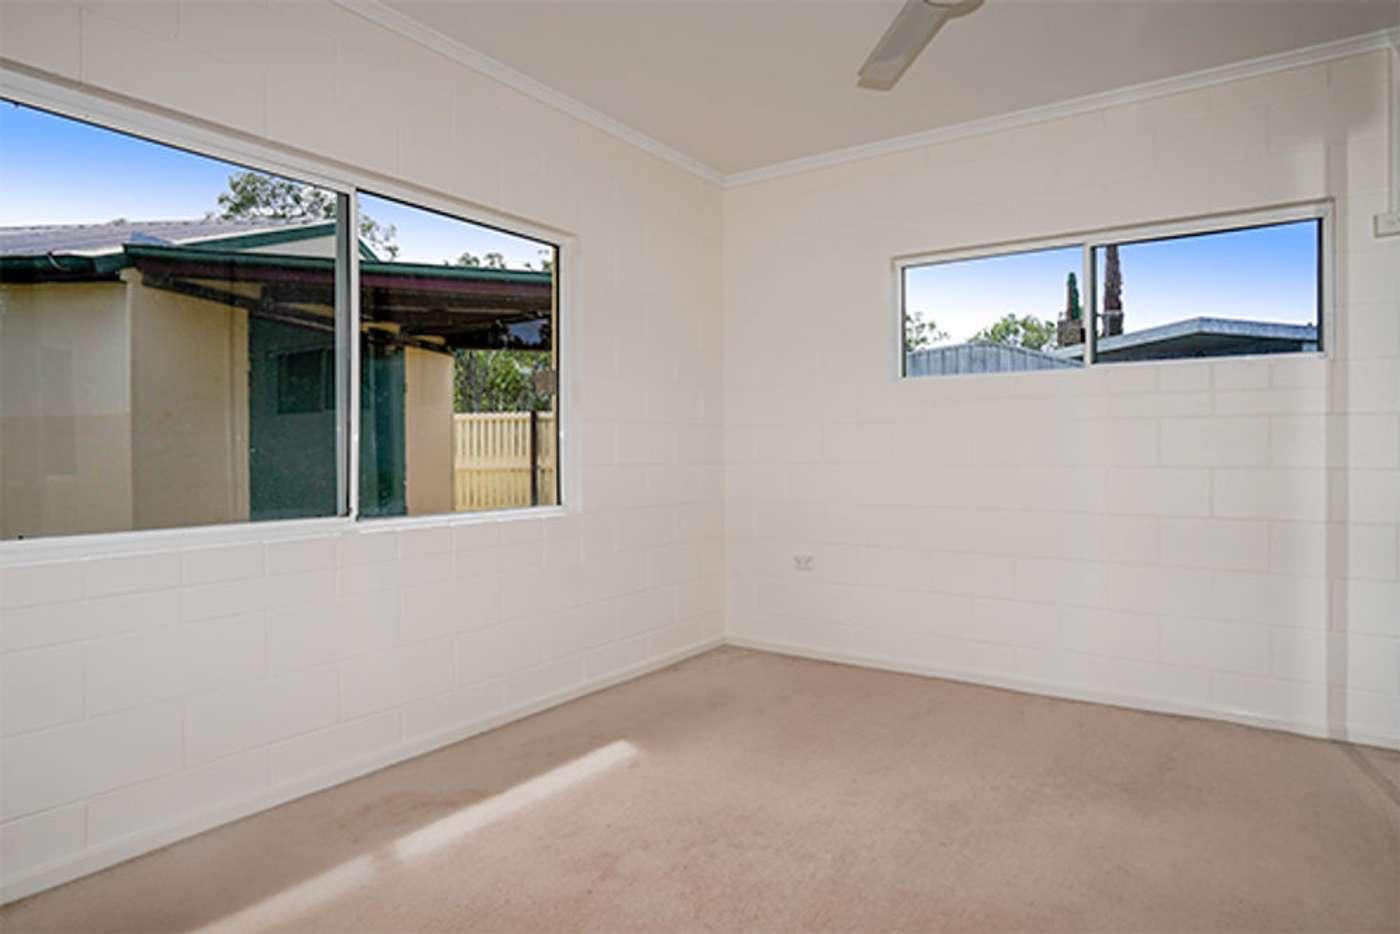 Sixth view of Homely house listing, 1 Brodziac Close, Mareeba QLD 4880